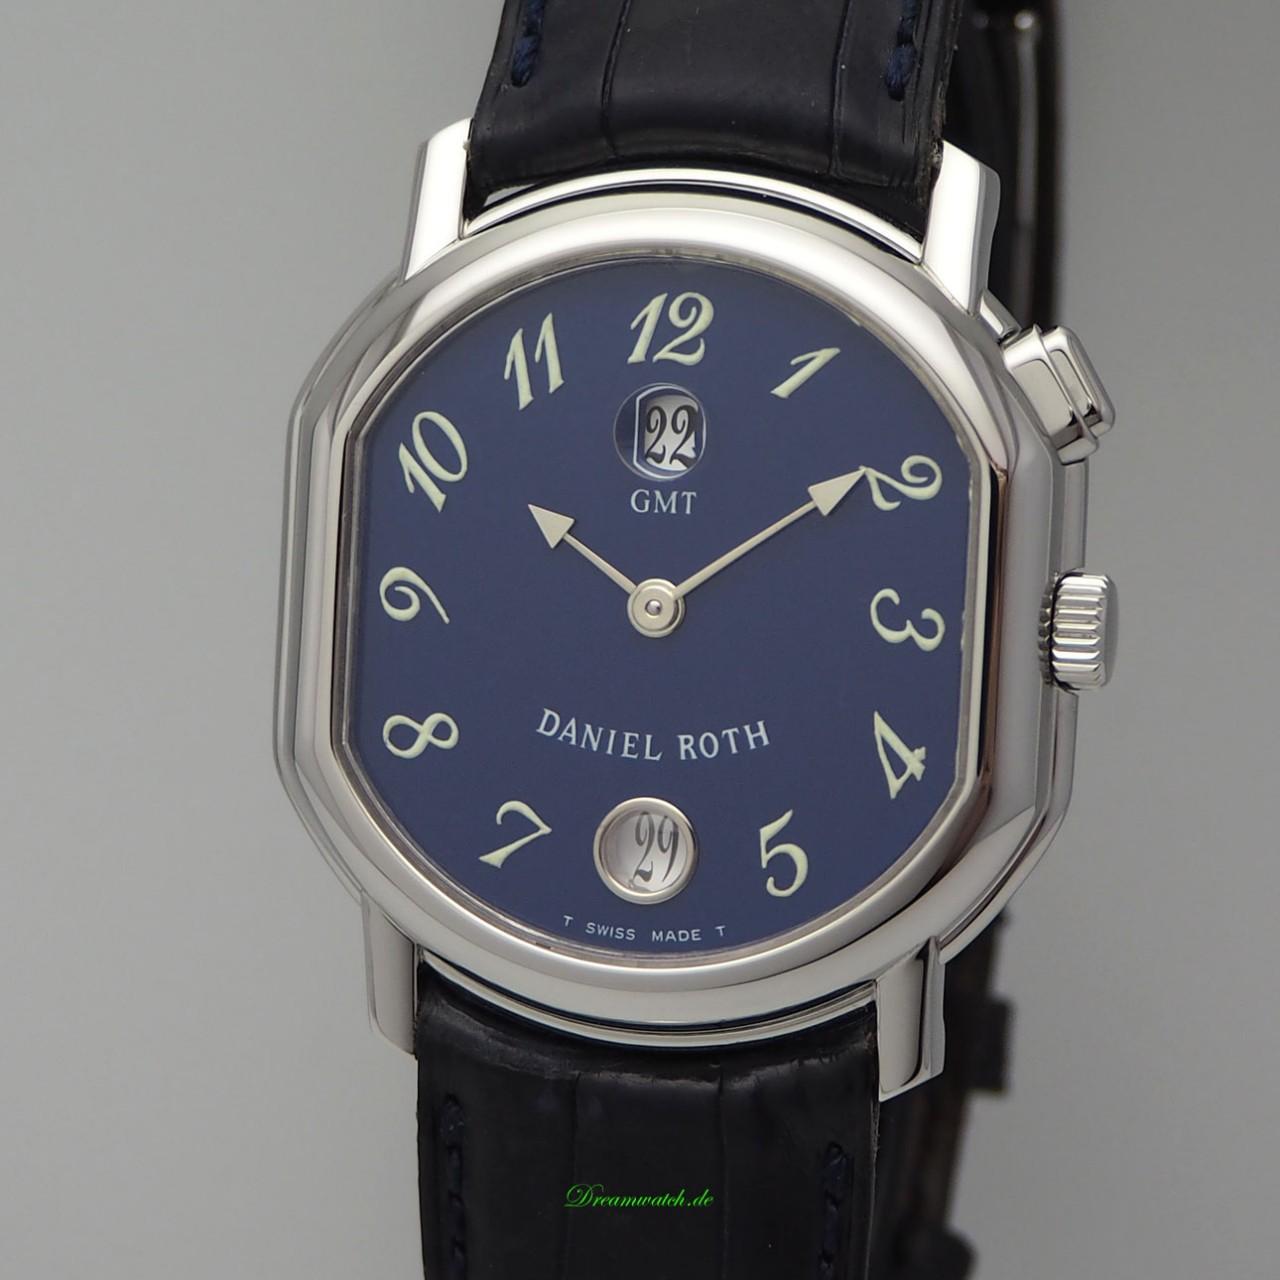 Daniel Roth Automatik GMT, Calendar 238 ST Stahl/Leder, Box / Perfect